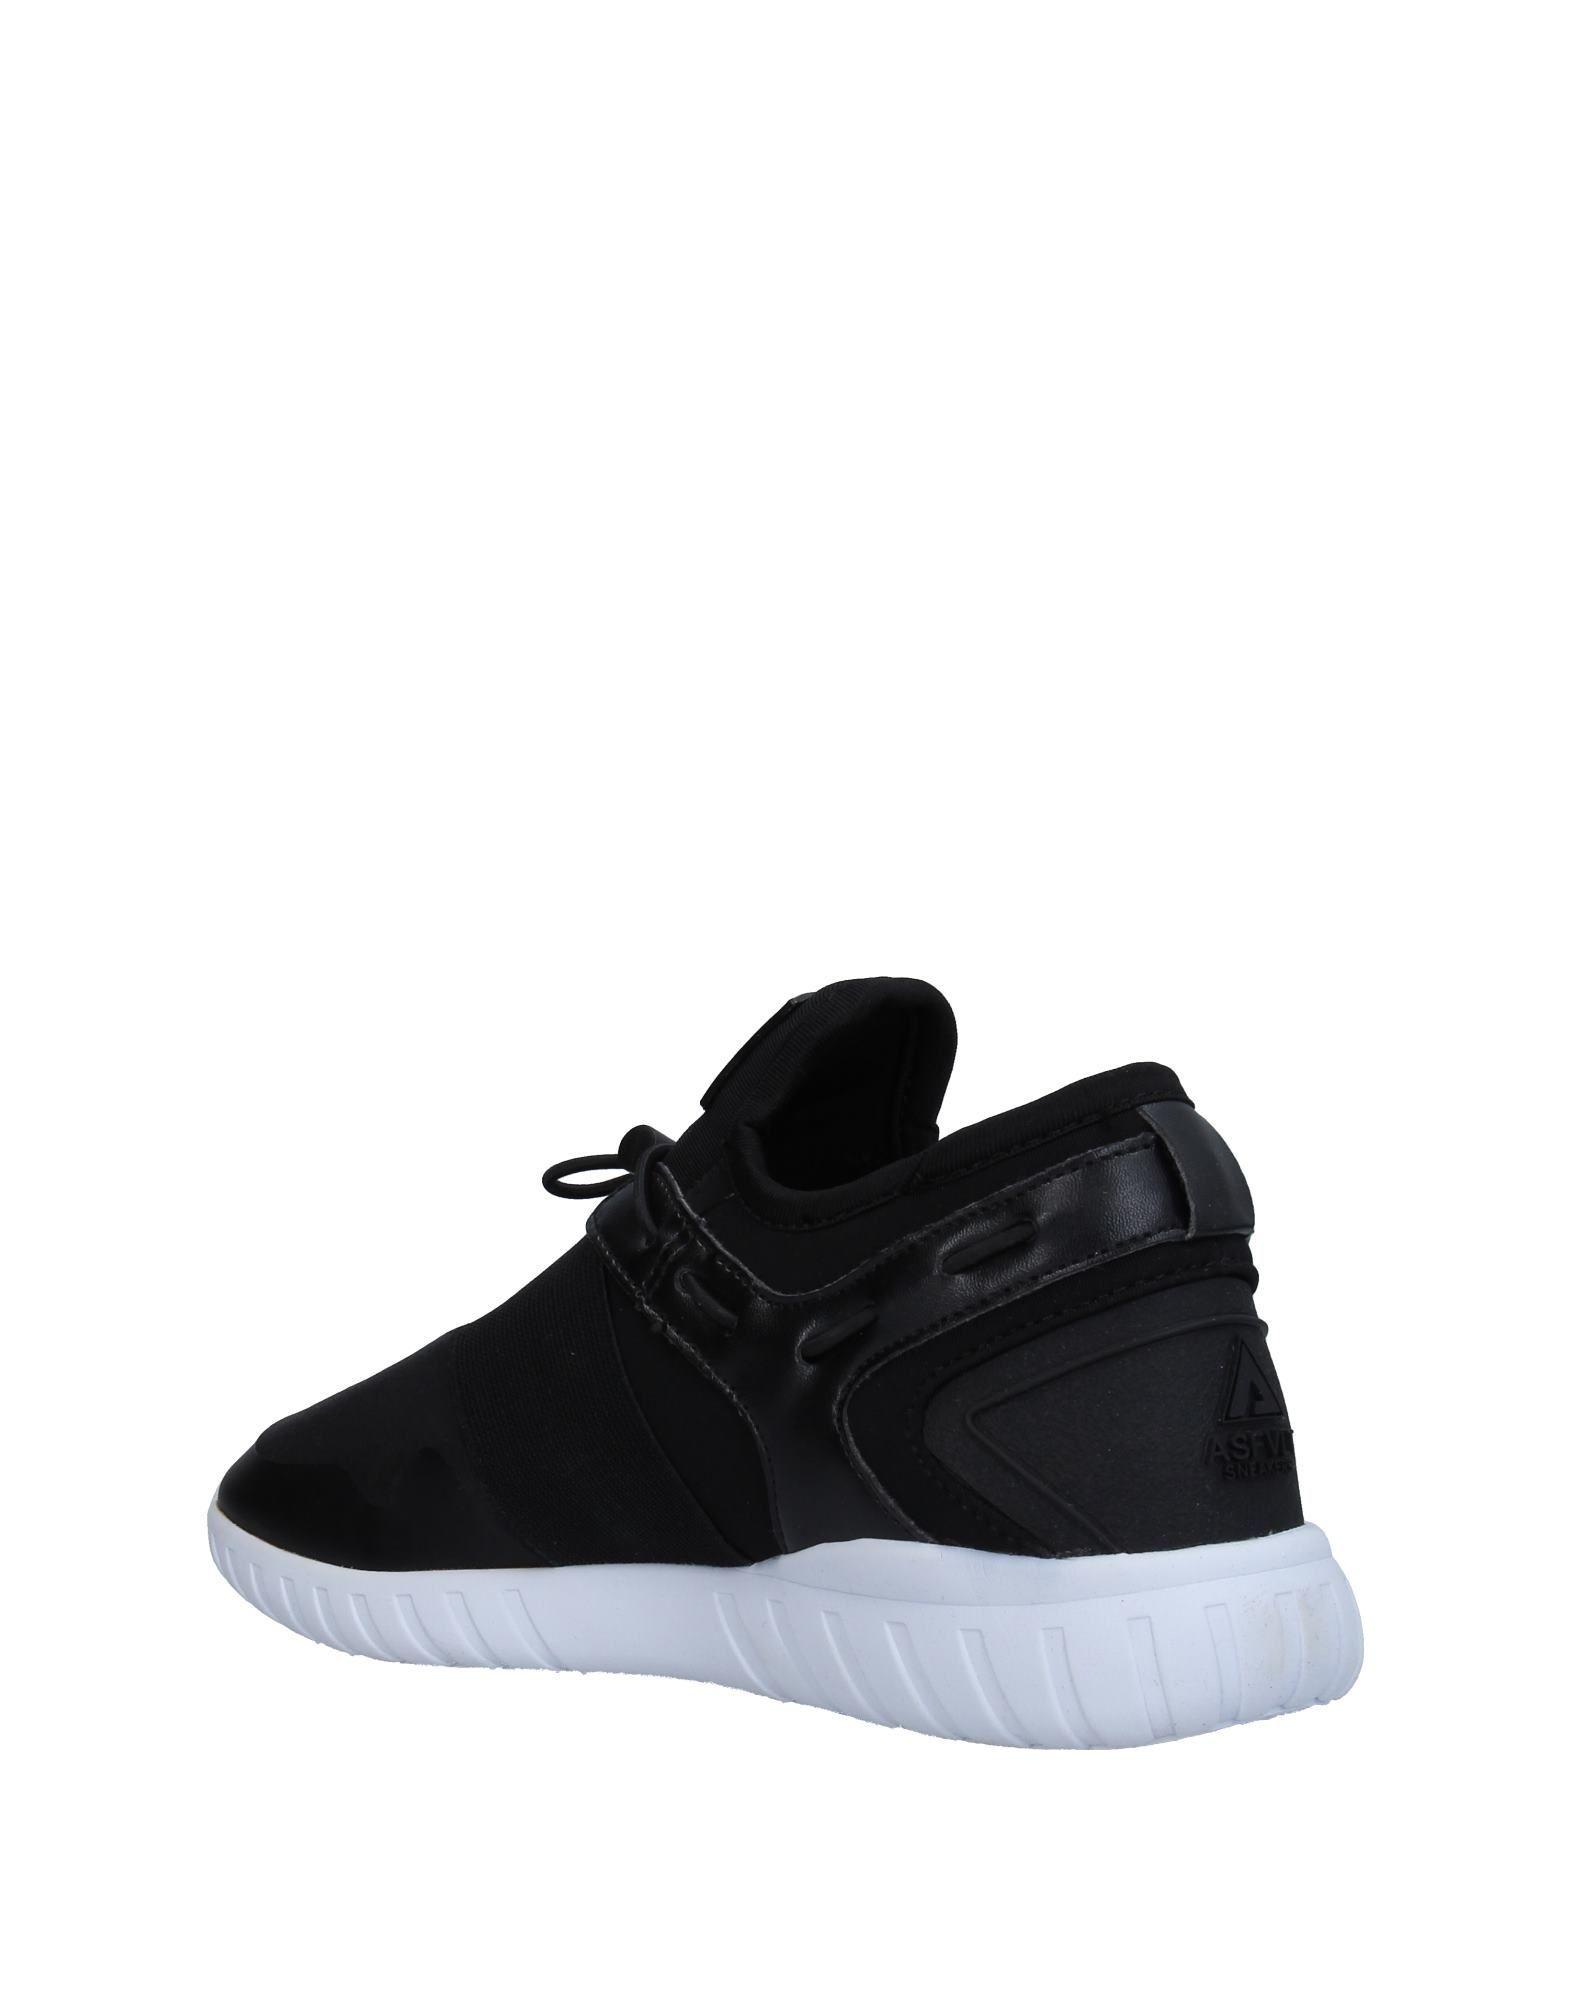 Asfvlt Black Sneakers